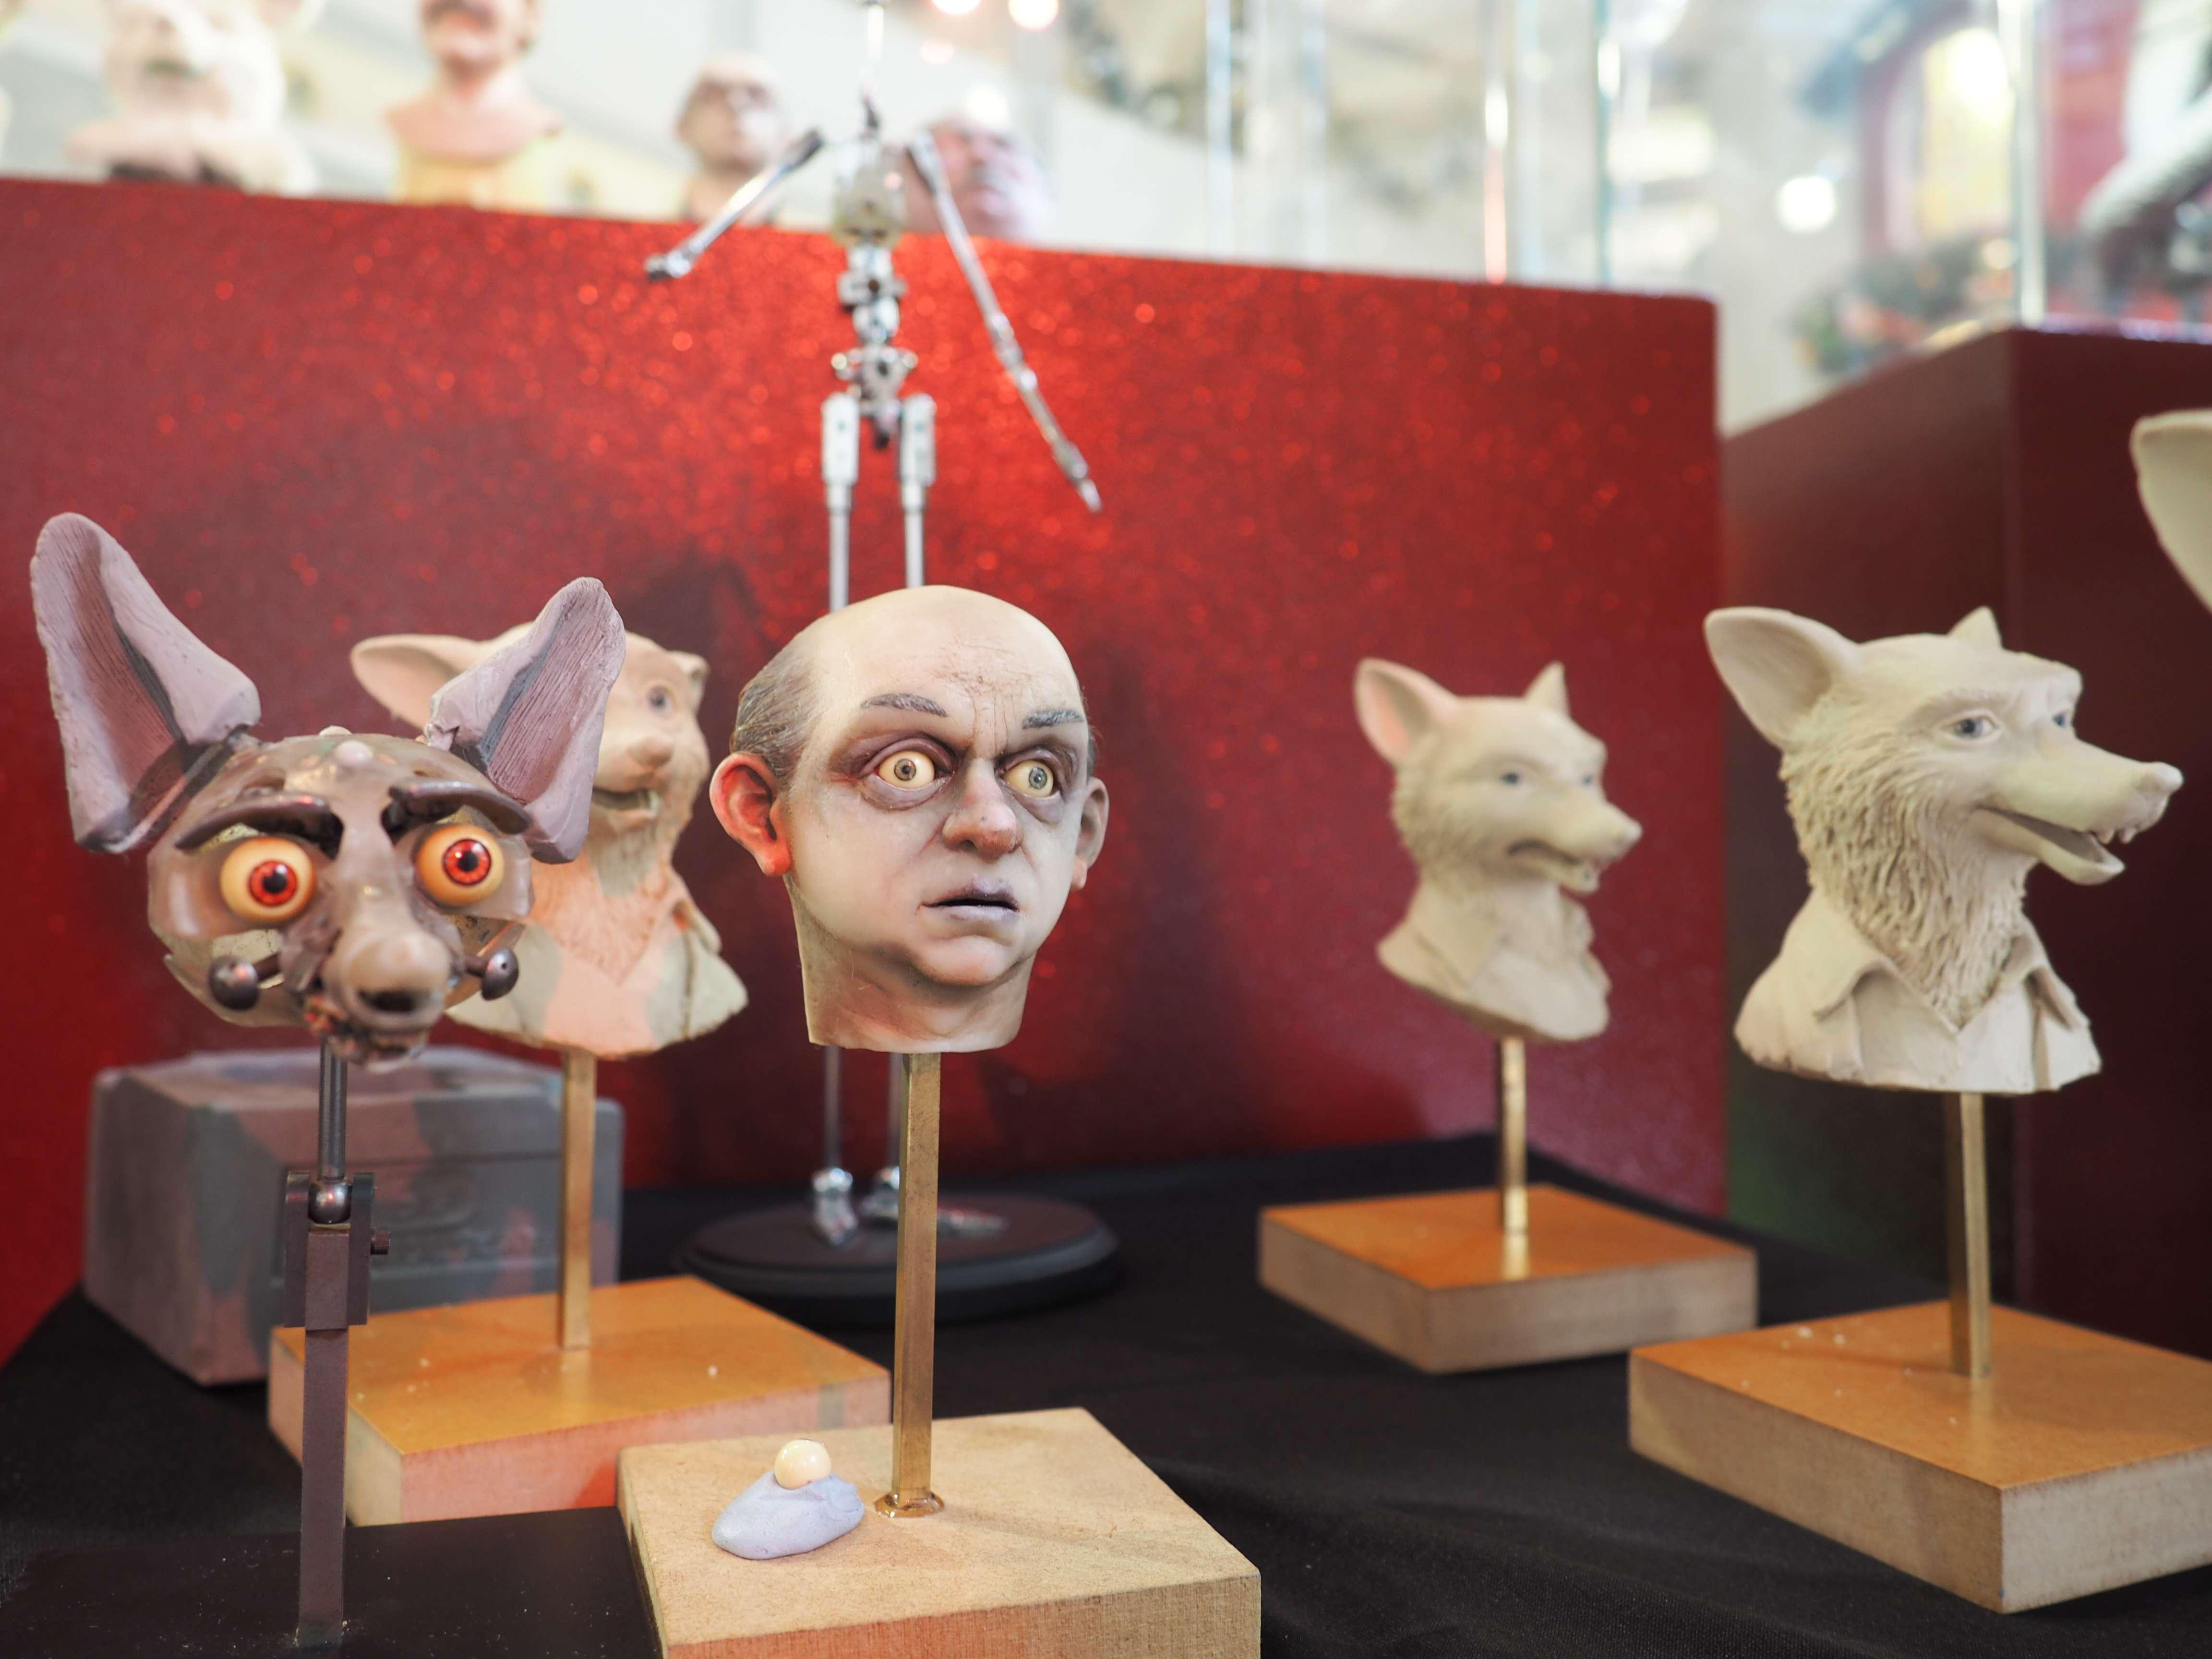 Fantastic Mr Fox Puppet Maker Ian Mackinnon Celebrates 100 Years Of Roald Dahl In Hong Kong Yp South China Morning Post